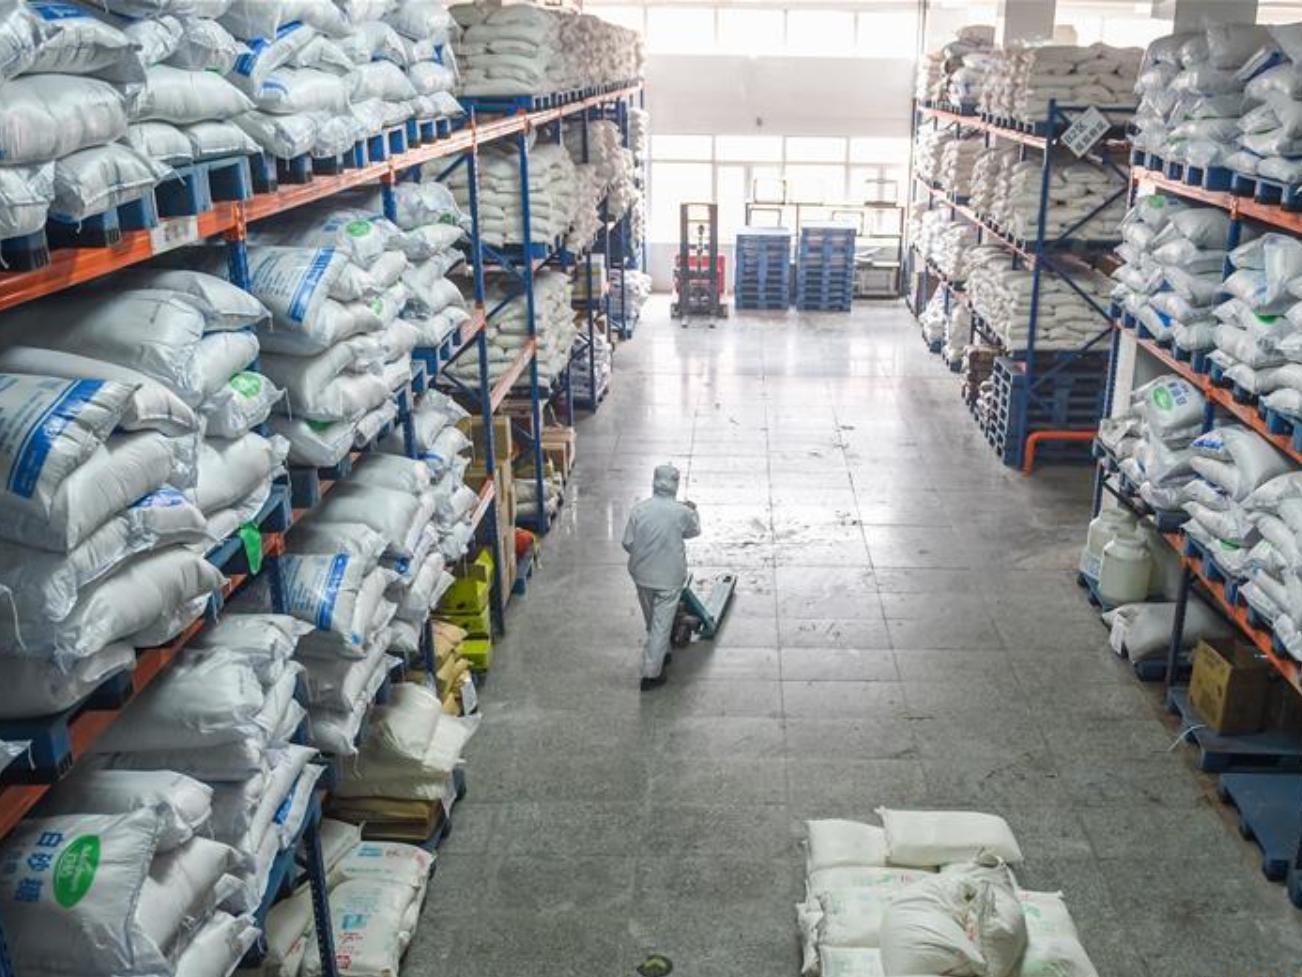 Companies resume production in fight against novel coronavirus outbreak